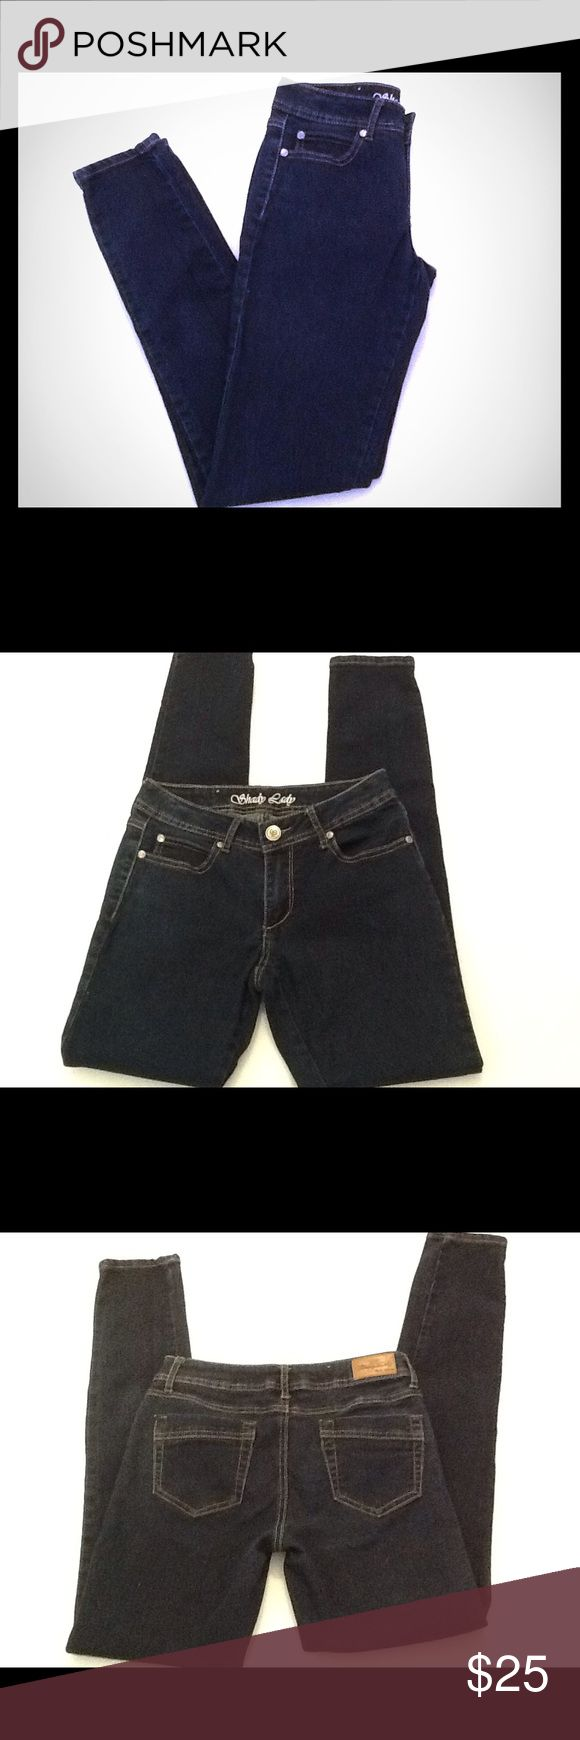 "Shady Lady Haute Attitude Denim Jeans Shady Lady Haute Attitude Denim Jeans .  76% Cotton, 22% Polyester, 2% Spandex. Women's size 5. Inseam is 32"". Leg Opening is 5 1/2"". Shady Lady Jeans"